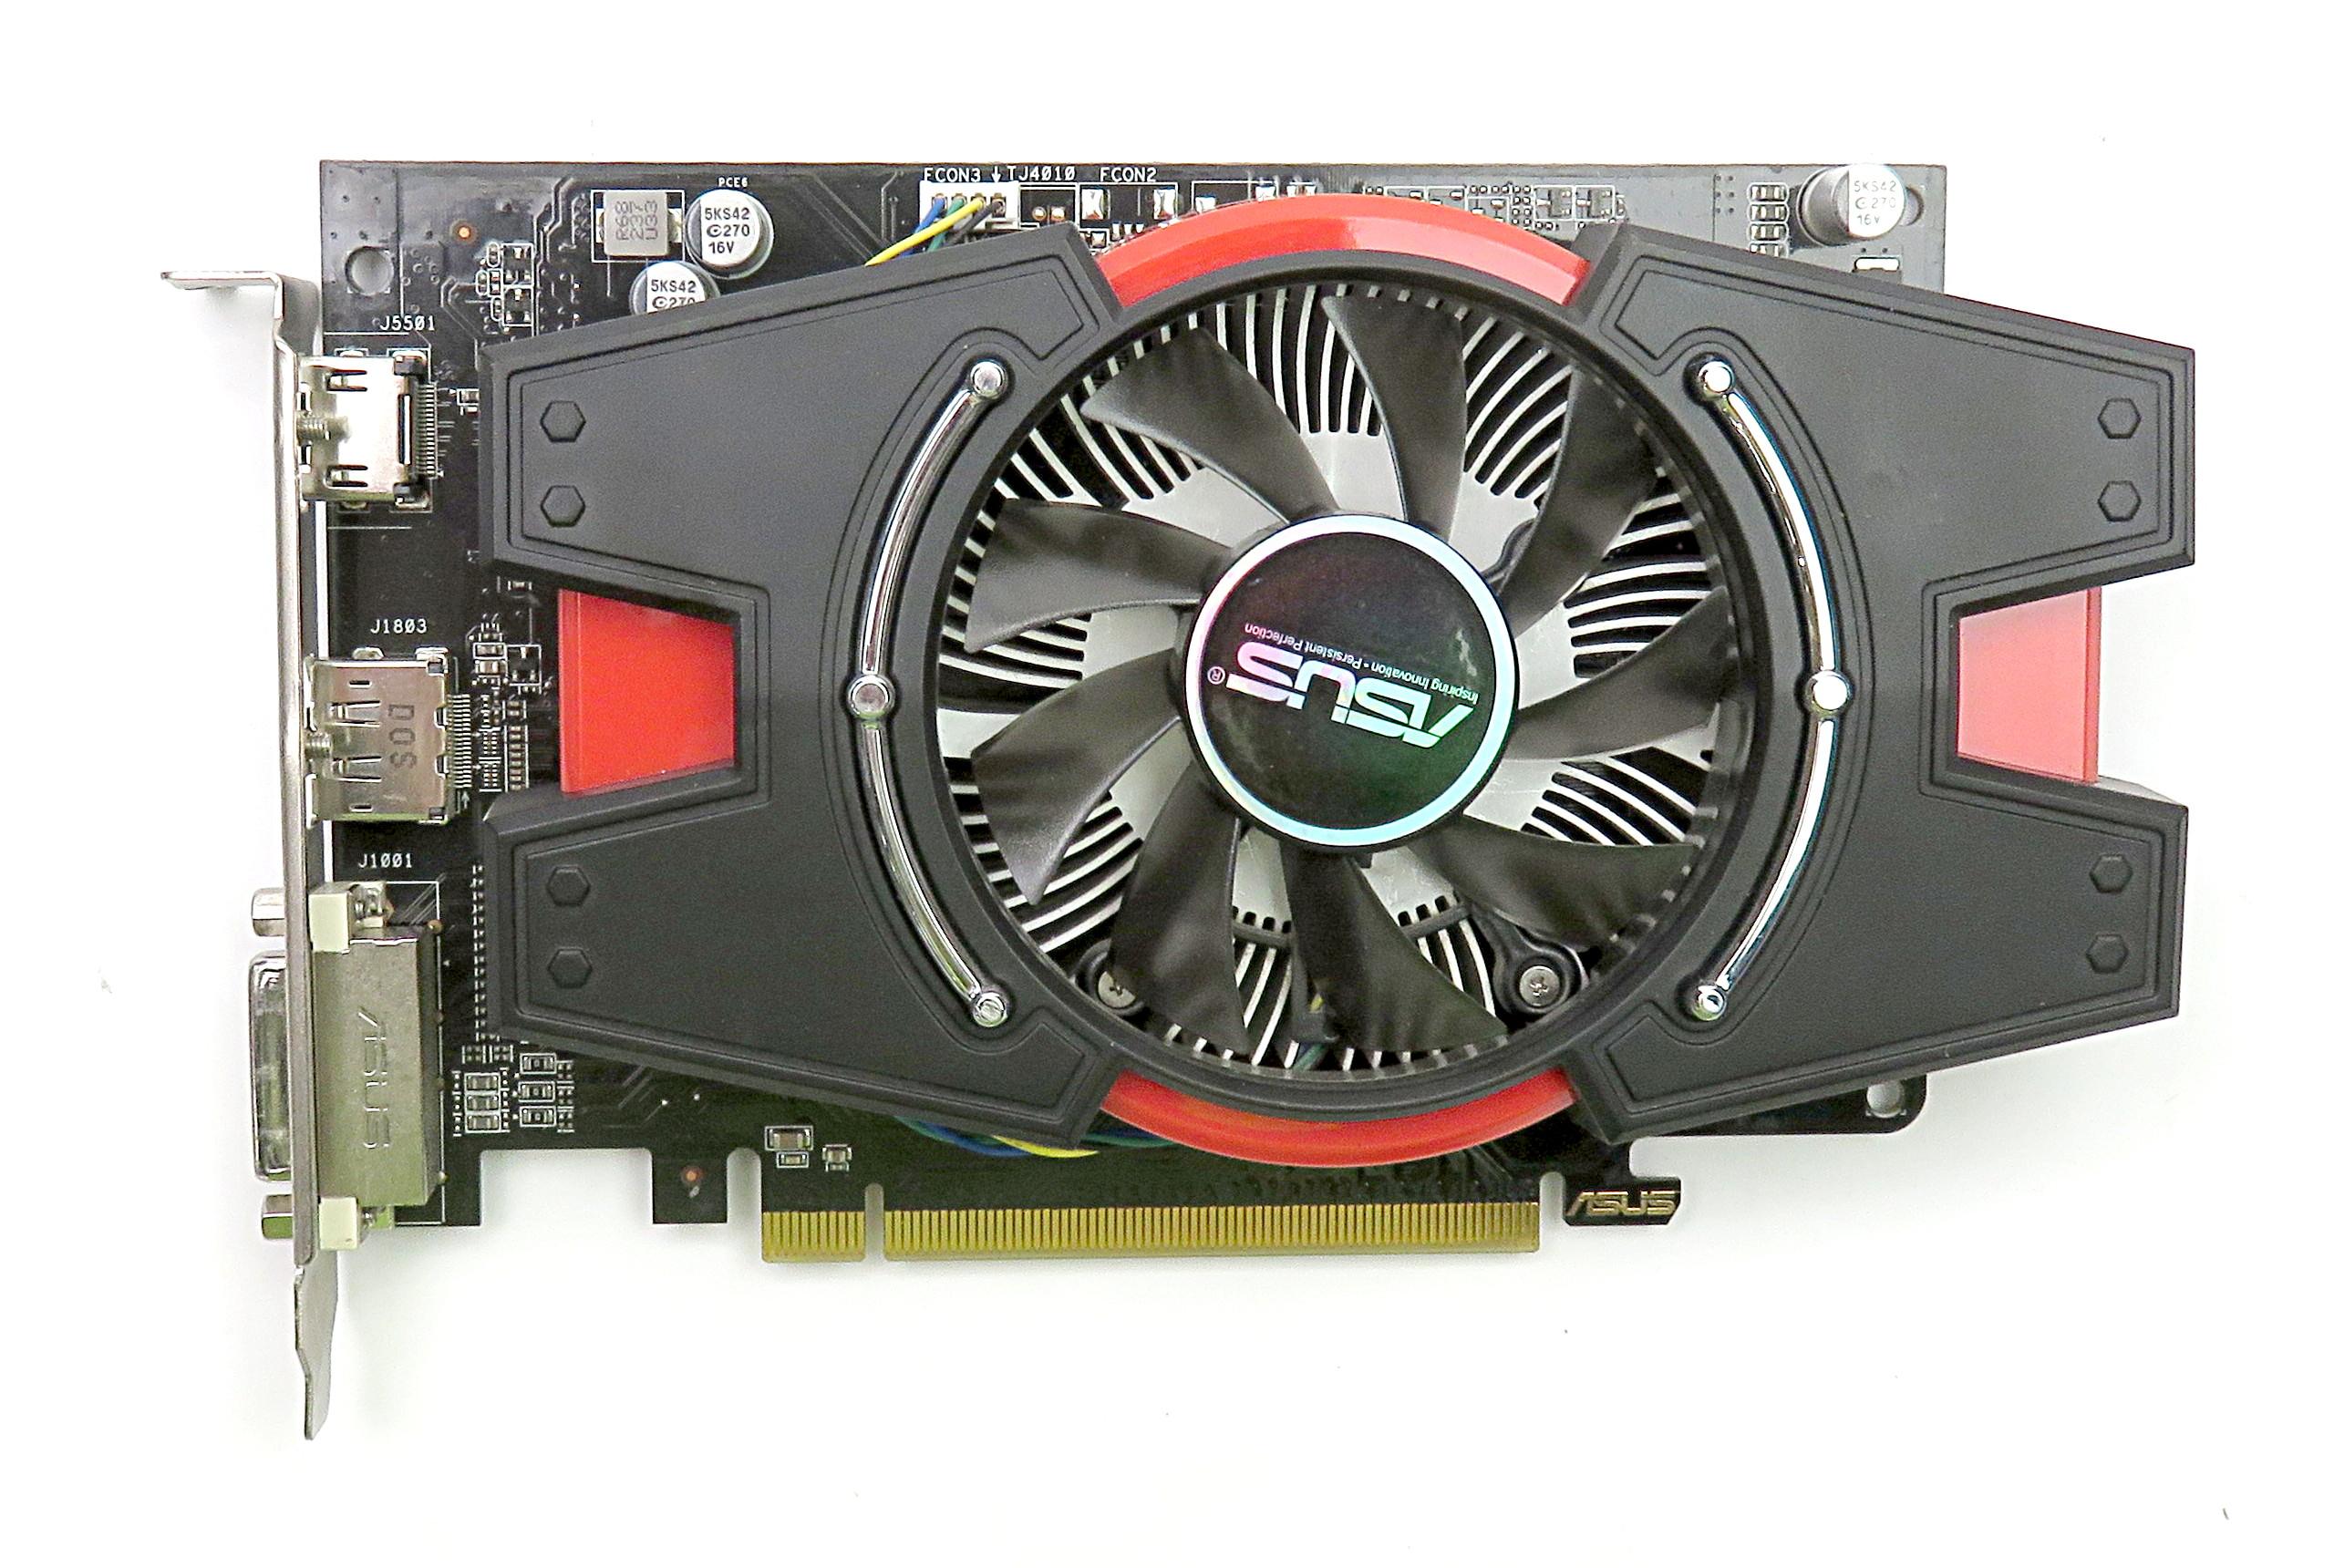 1gd5 Hdmi Dp Dvi I Asus Amd Radeon Hd 6670 1gb Gddr5 Graphics Card Eah6670 Dis 1gd5 Hdmi Dp Dvi I Refurbished Graphics Cards Blackmore It